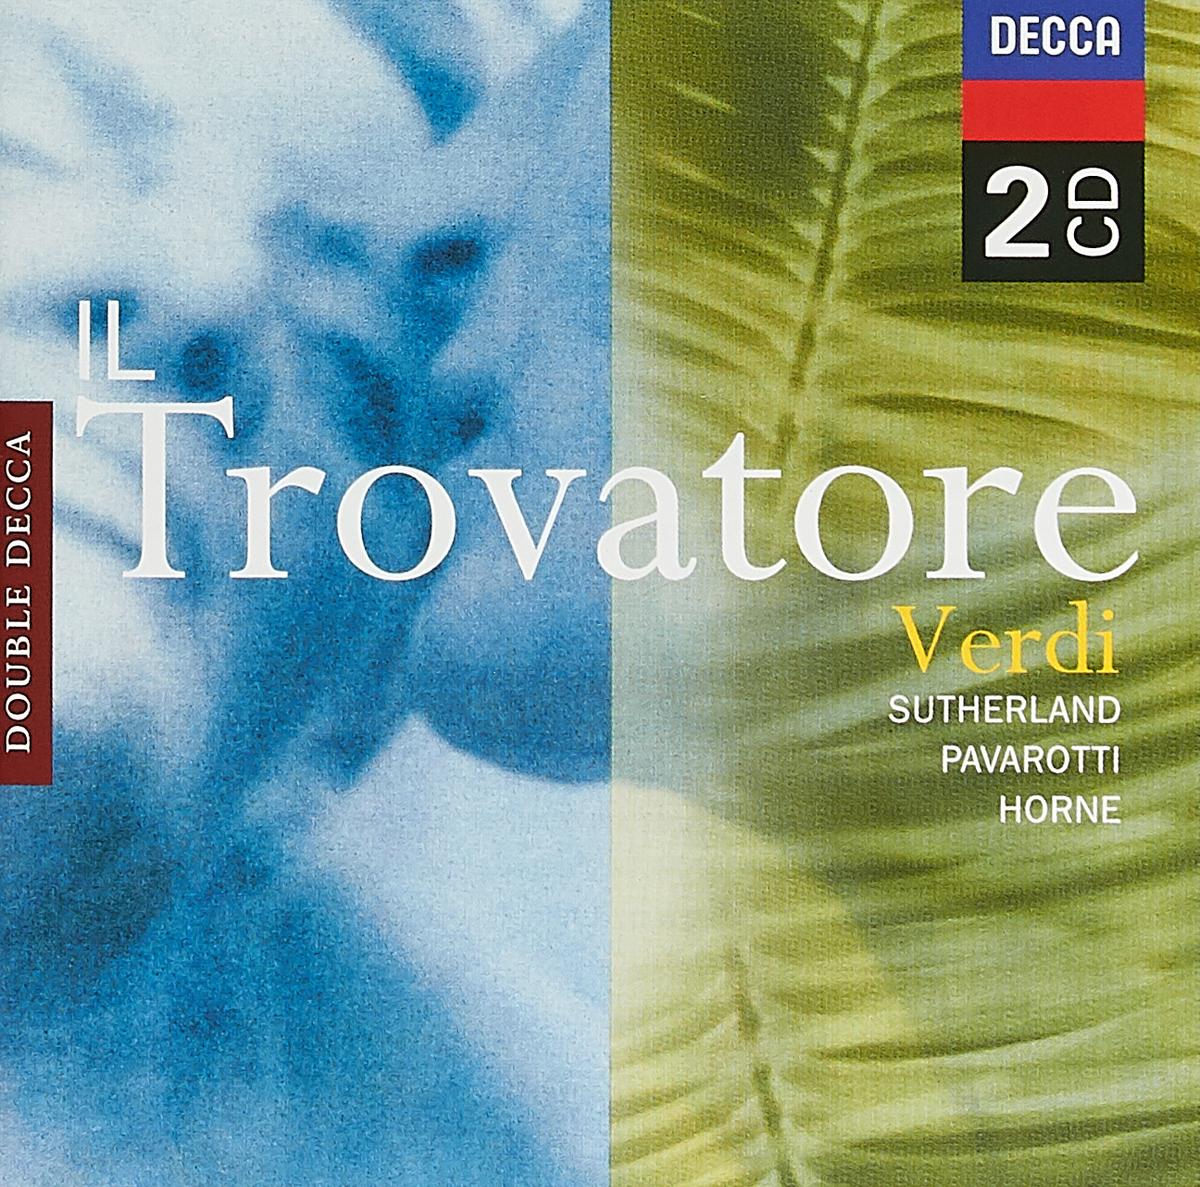 Bonynge, Richard. Ghiaurov, Nicolai Verdi: Il Trovatore verdi il trovatore blu ray